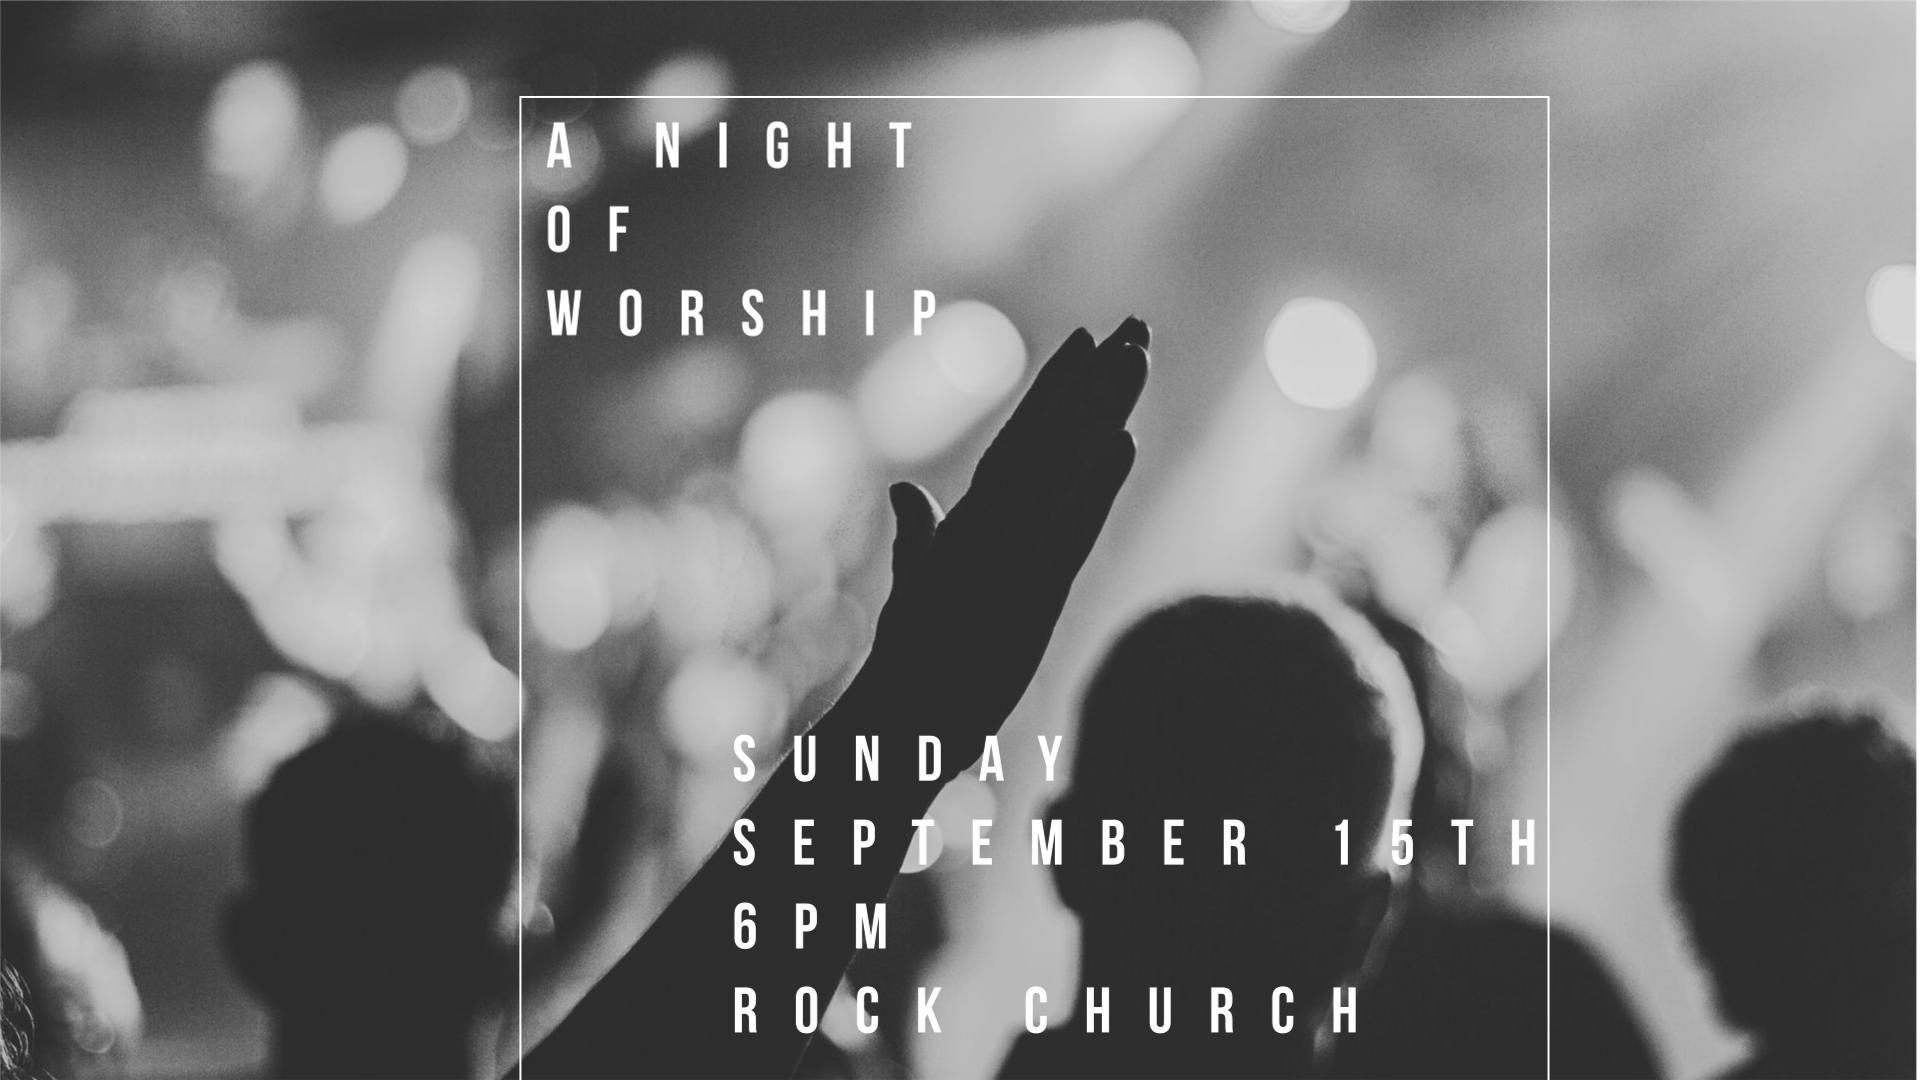 Night_of_Worship.jpg